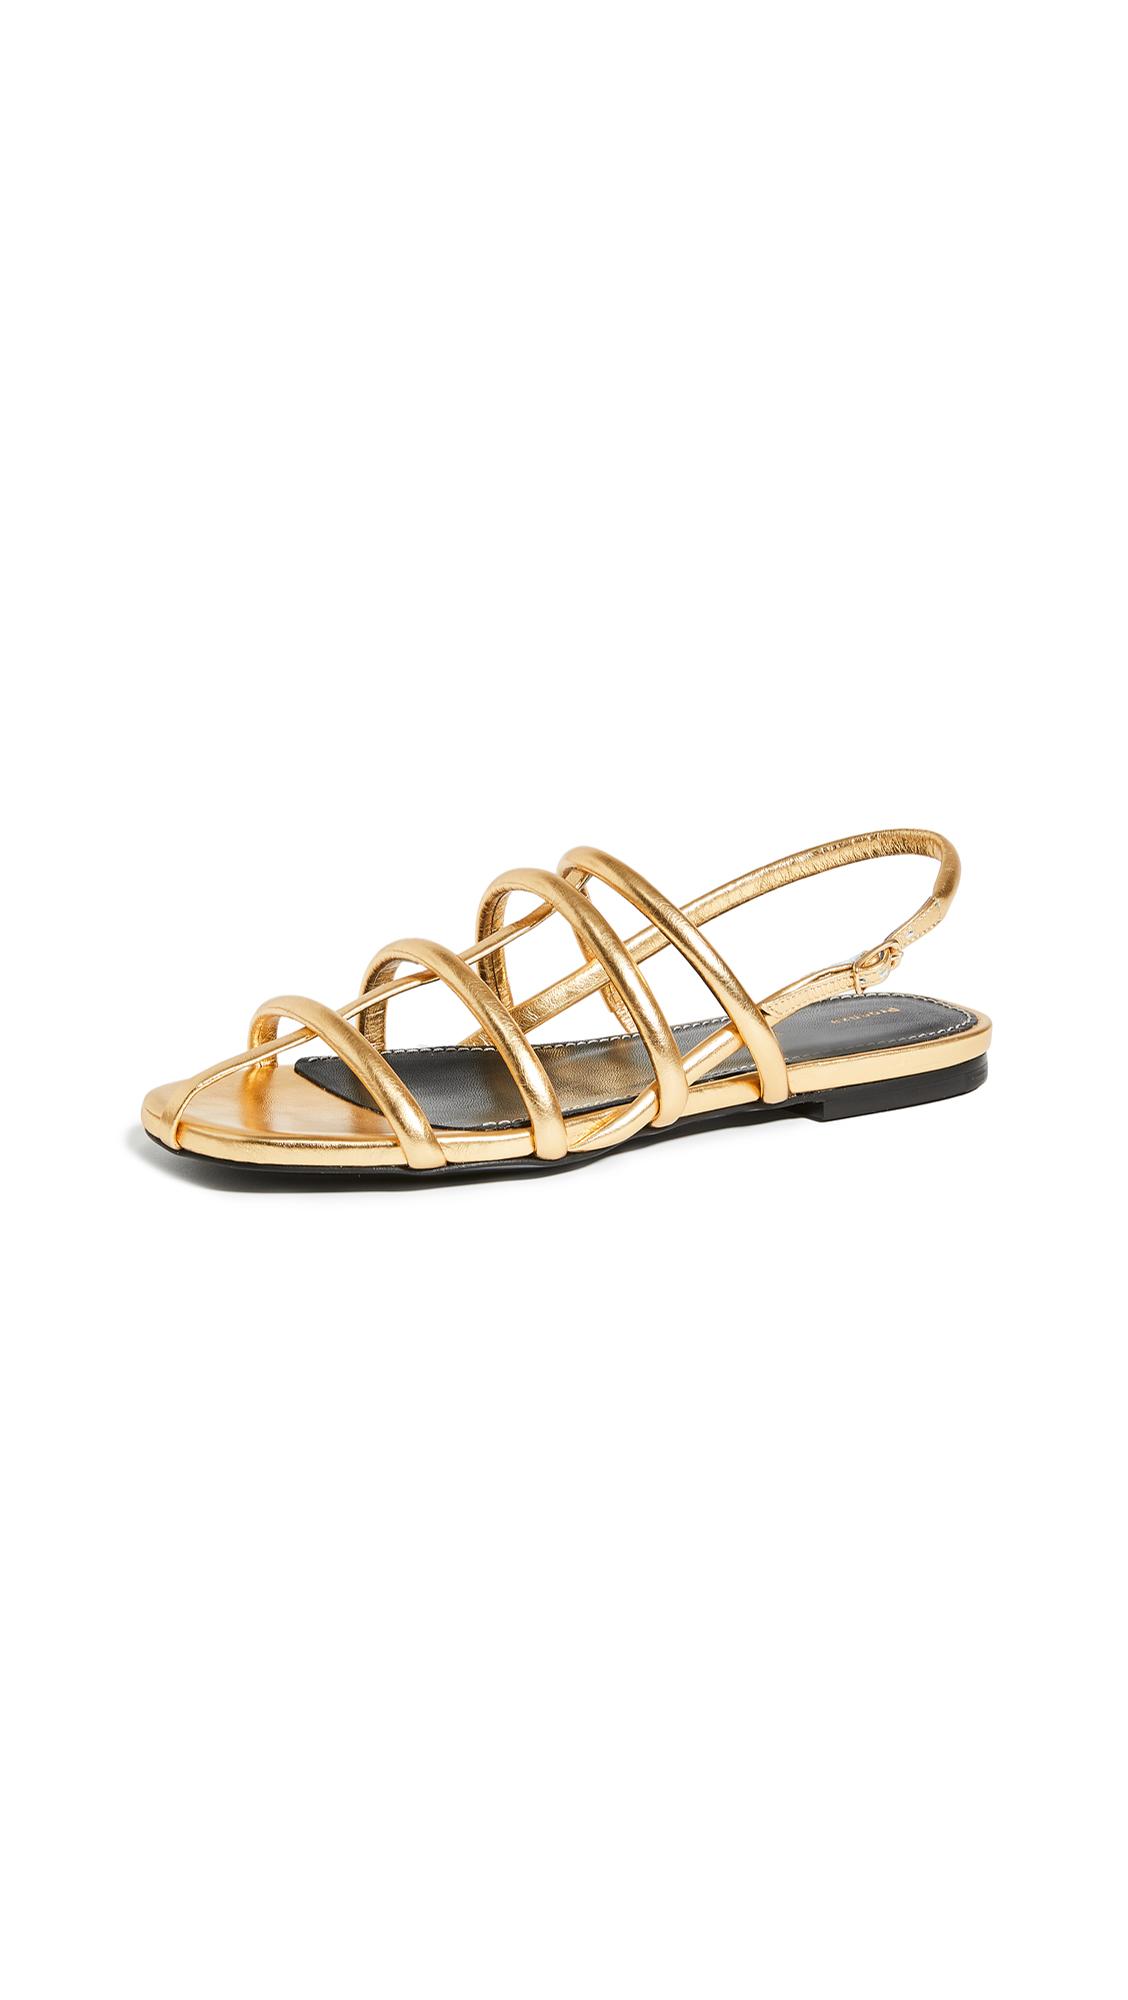 Proenza Schouler Strappy Flat Sandals - 40% Off Sale